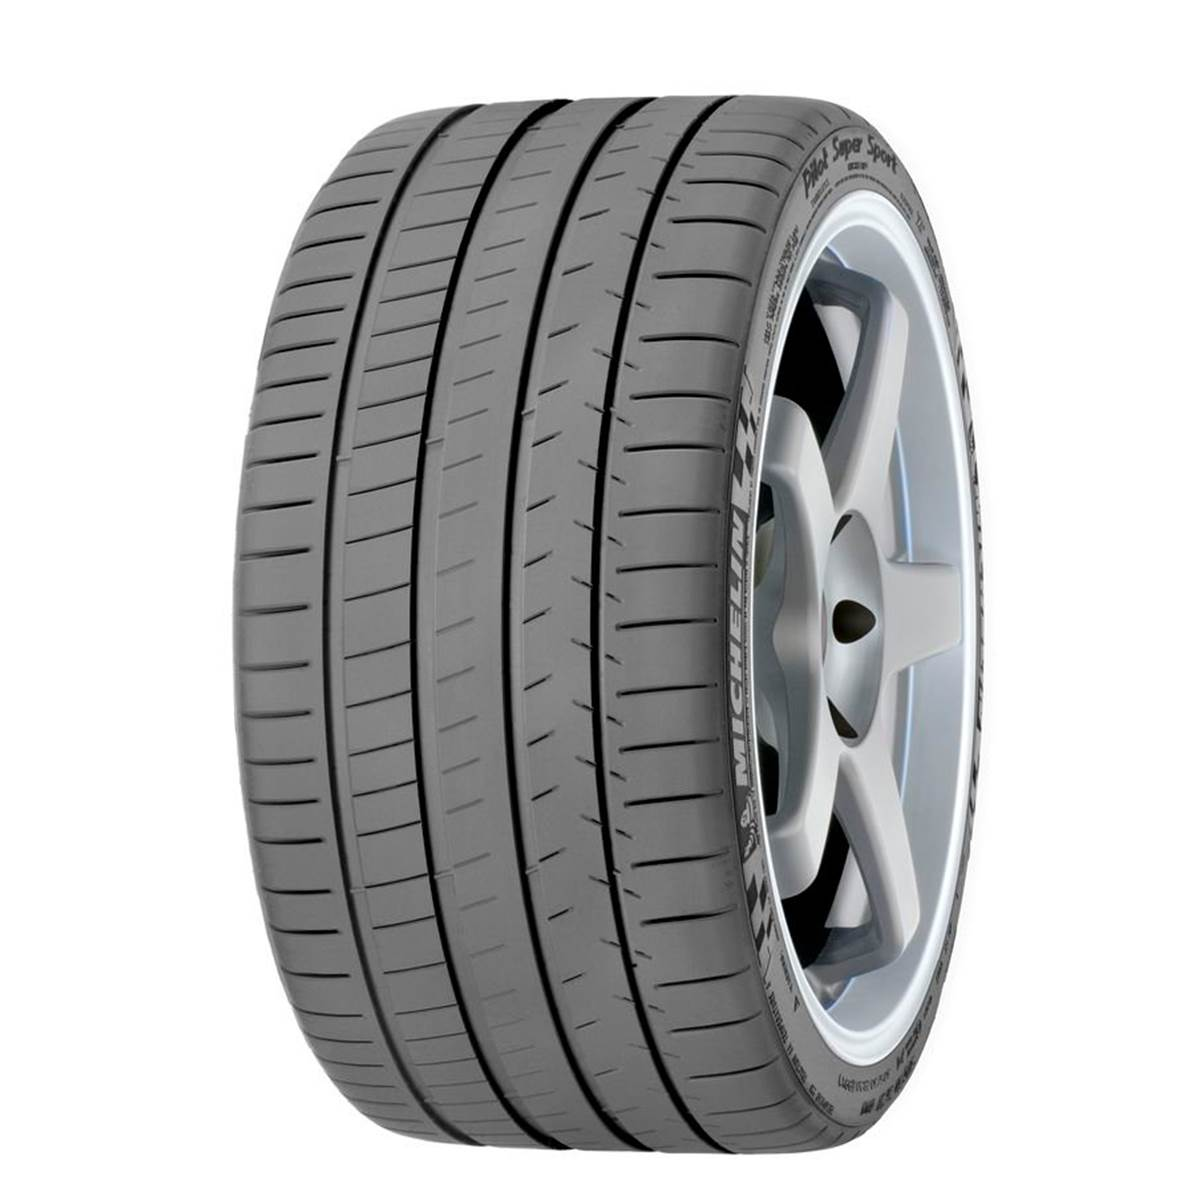 Pneu Michelin 265/30R21 96Y Pilot Super Sport XL